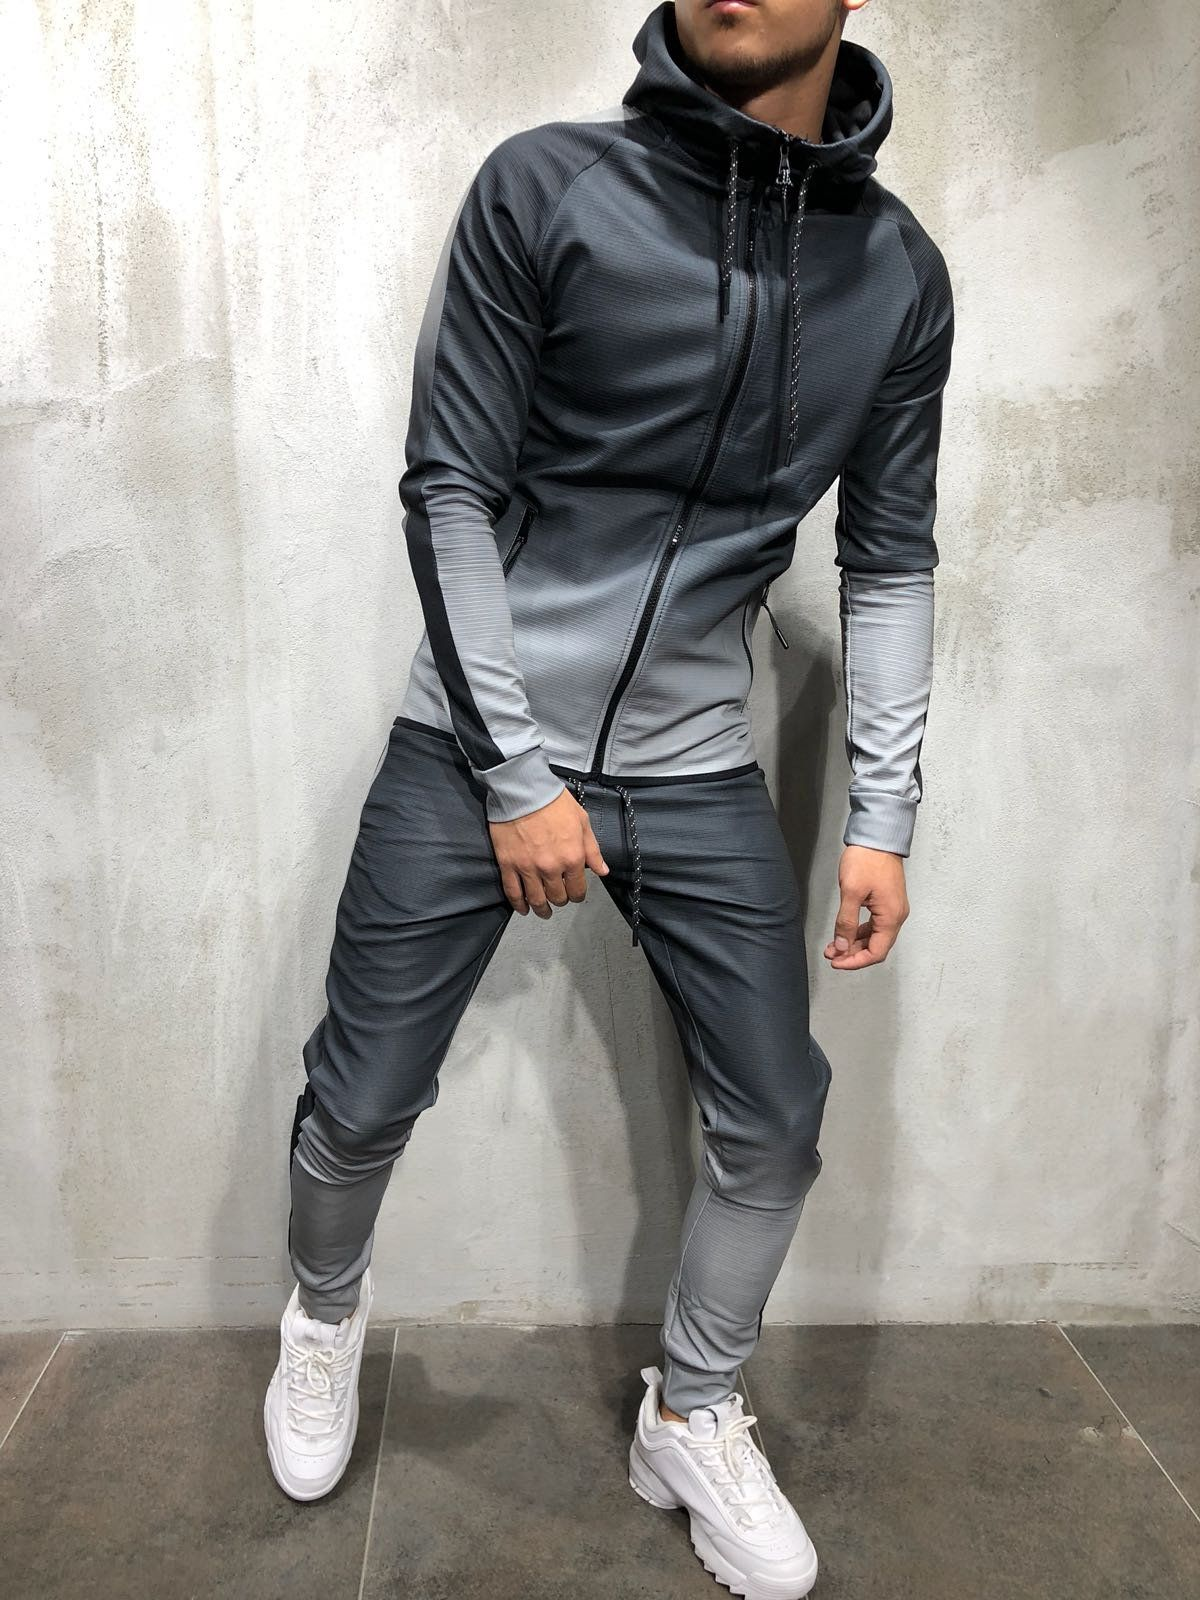 Mens Jogging Suit Tracksuit Hooded Jacket Sweatpants Training Pullover Sport Set